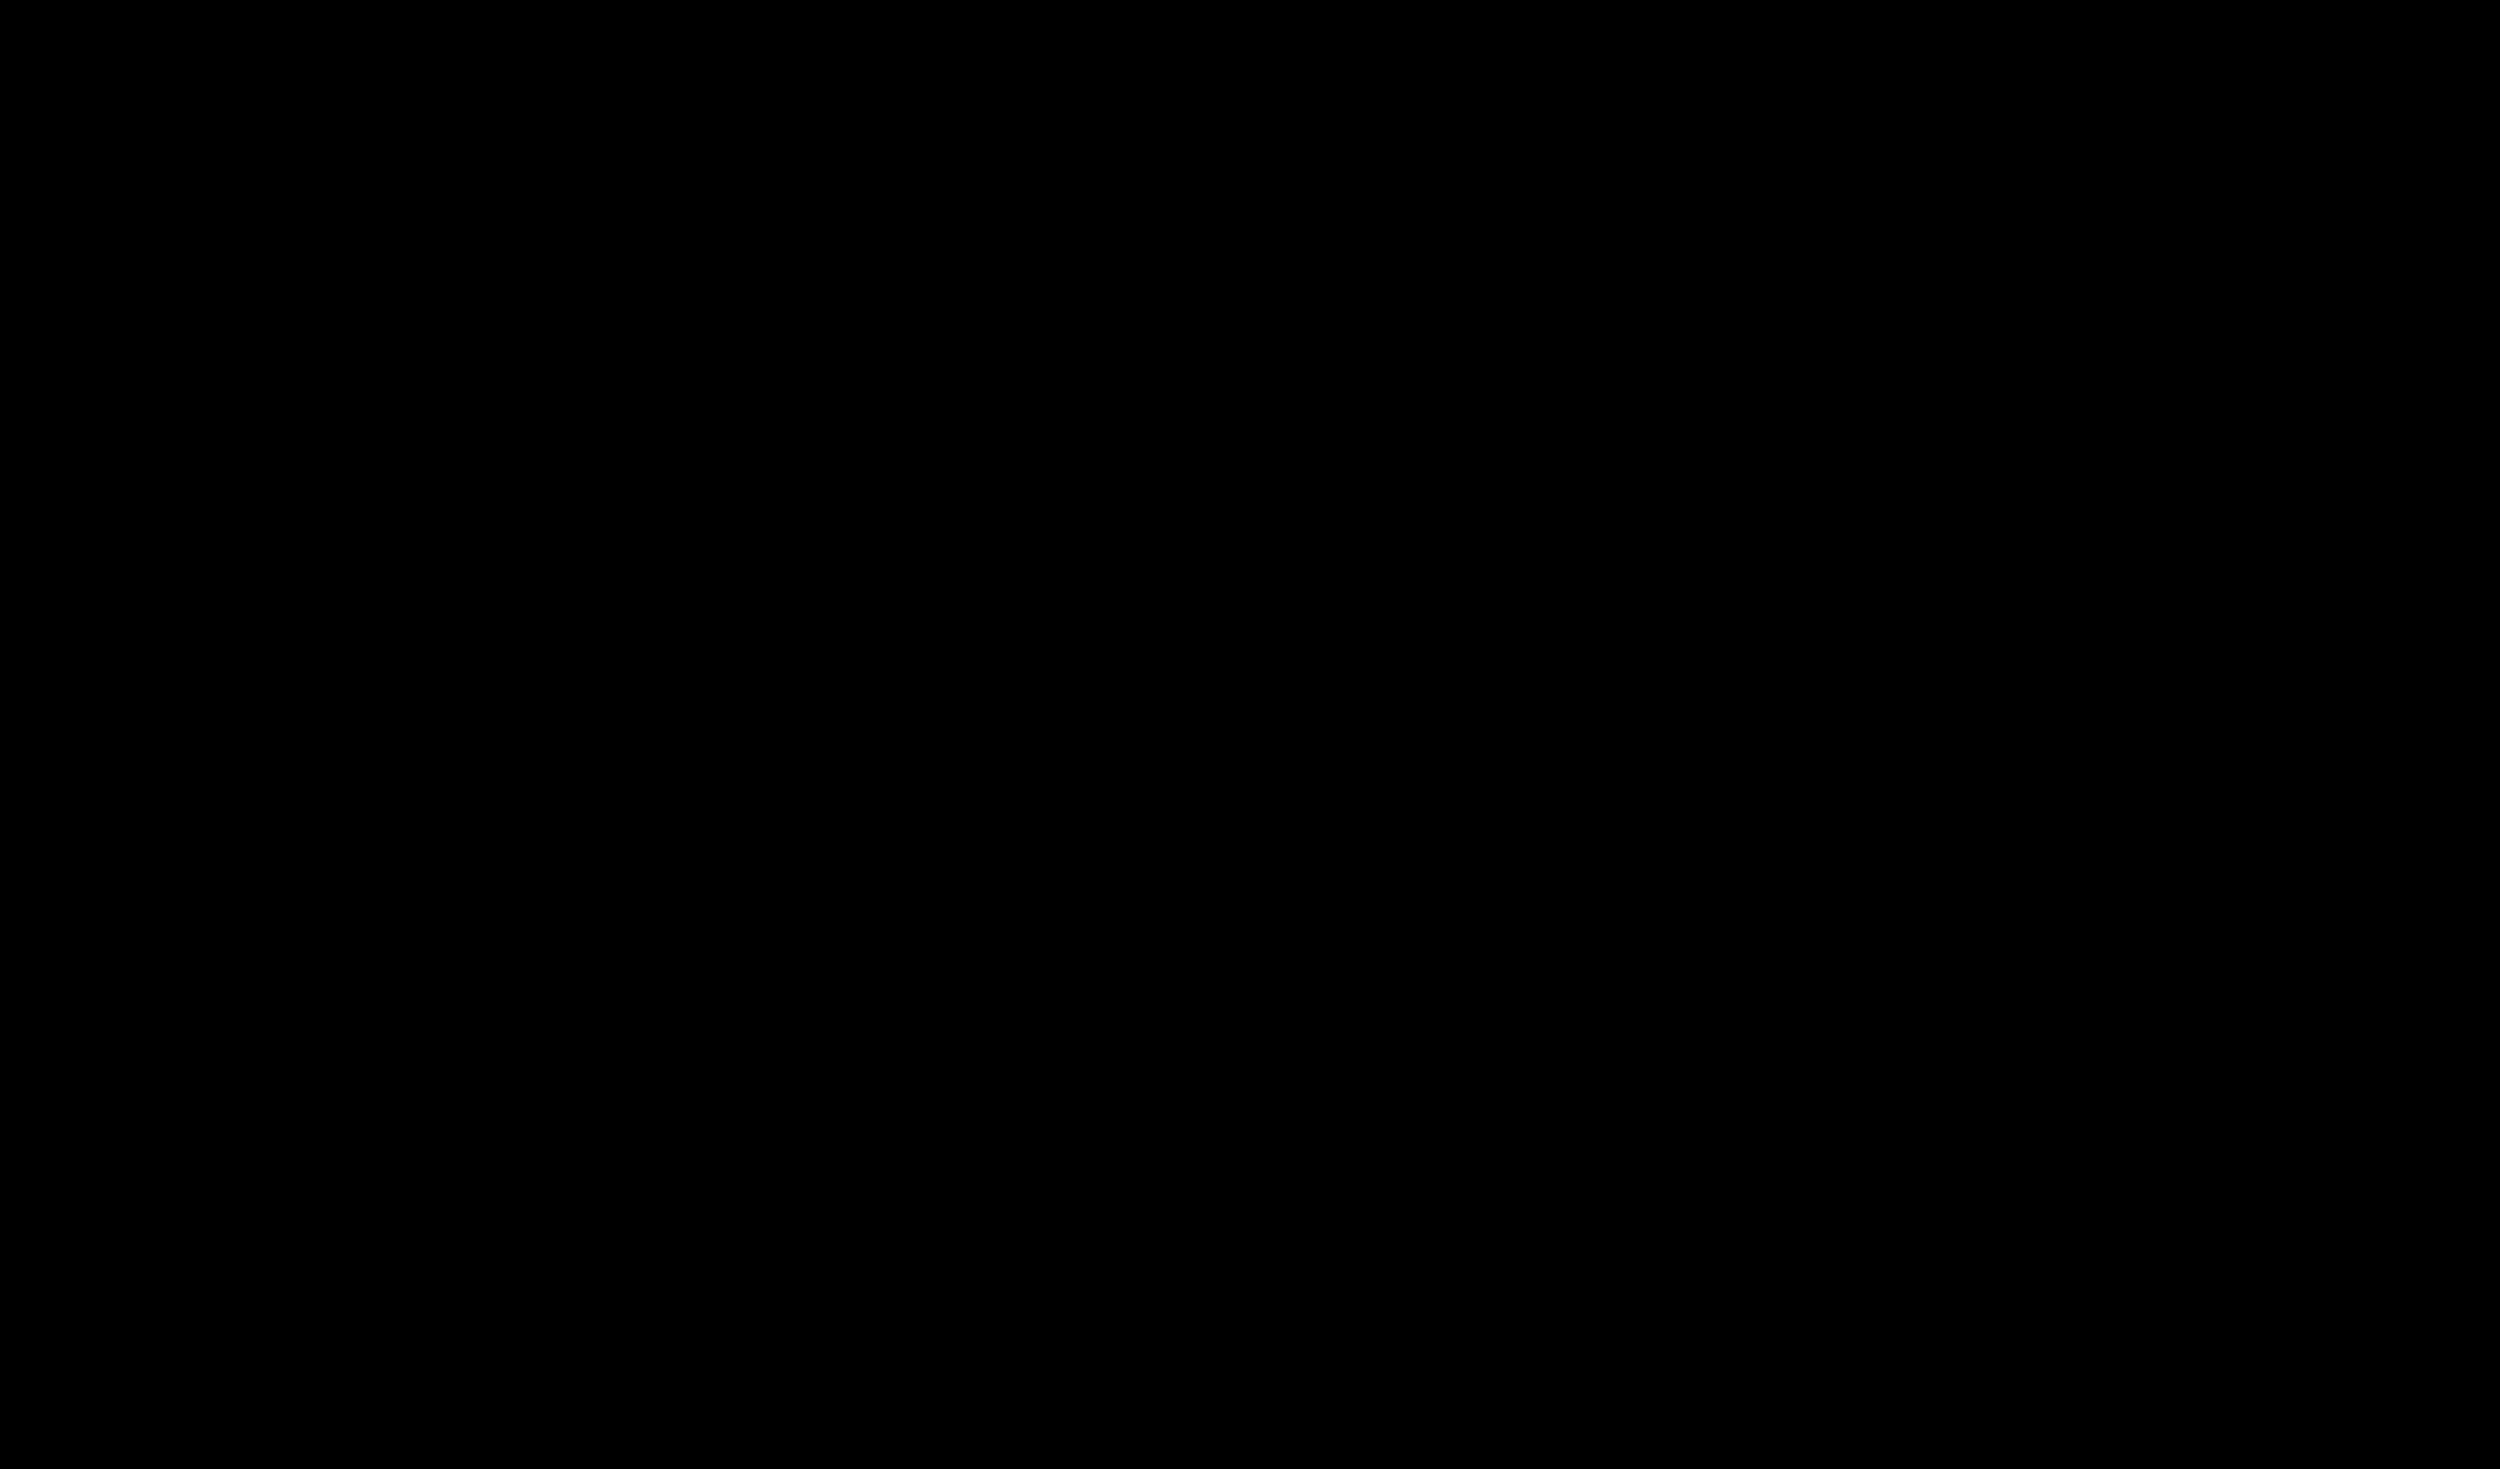 Copie de ARTEBOREAL_LOGO2017.png